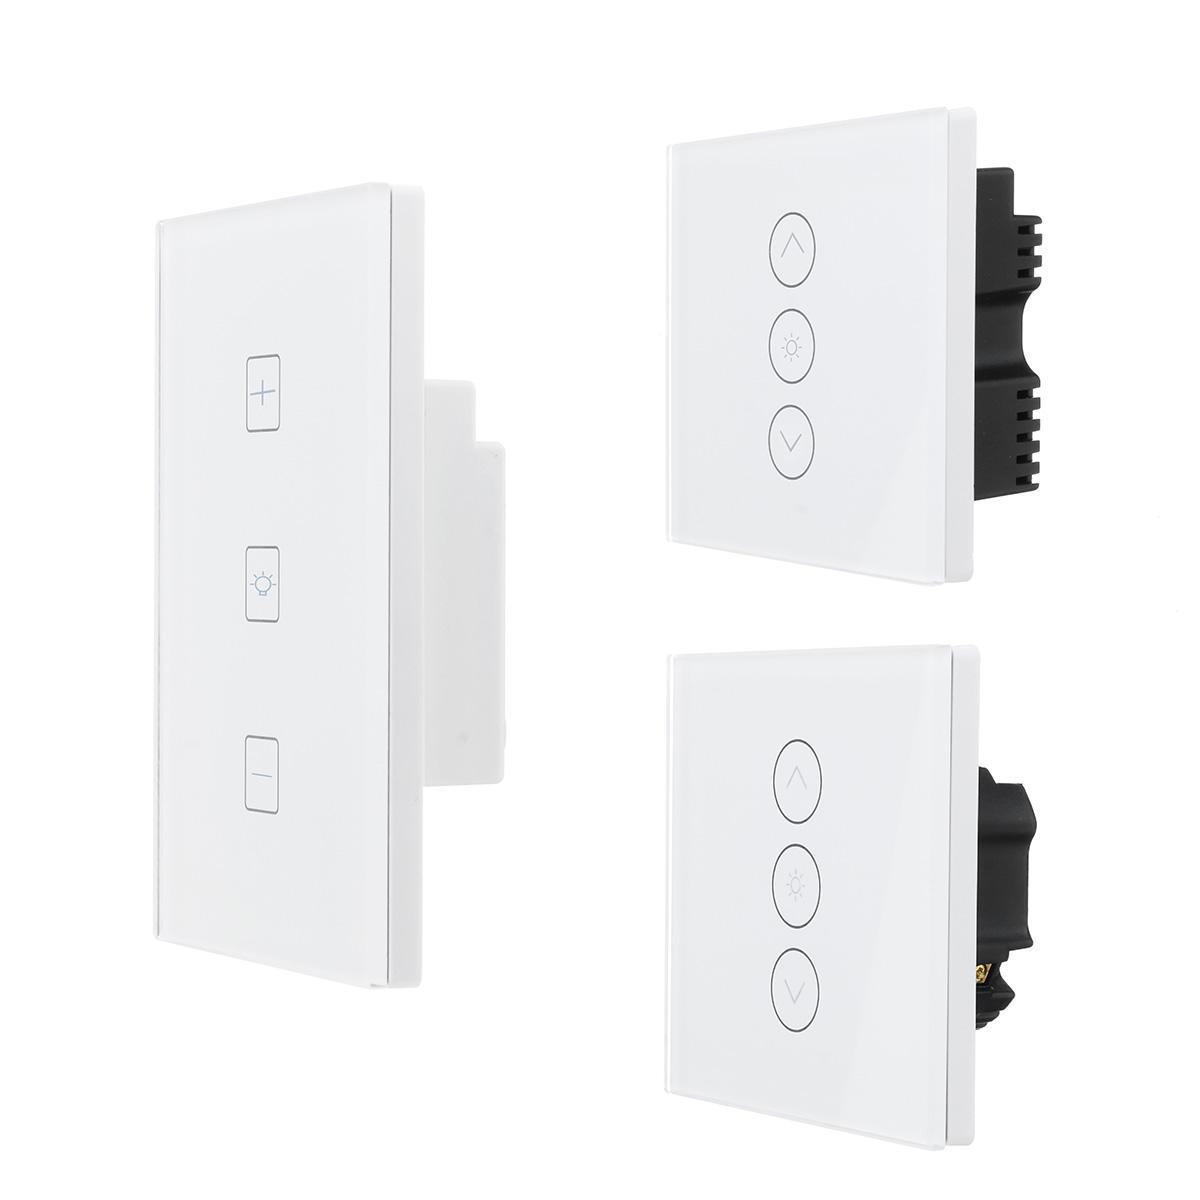 WIFI Smart Dimmer Light Wall Switch Sentuh Remote Control Bekerja dengan Alexa / Google Home